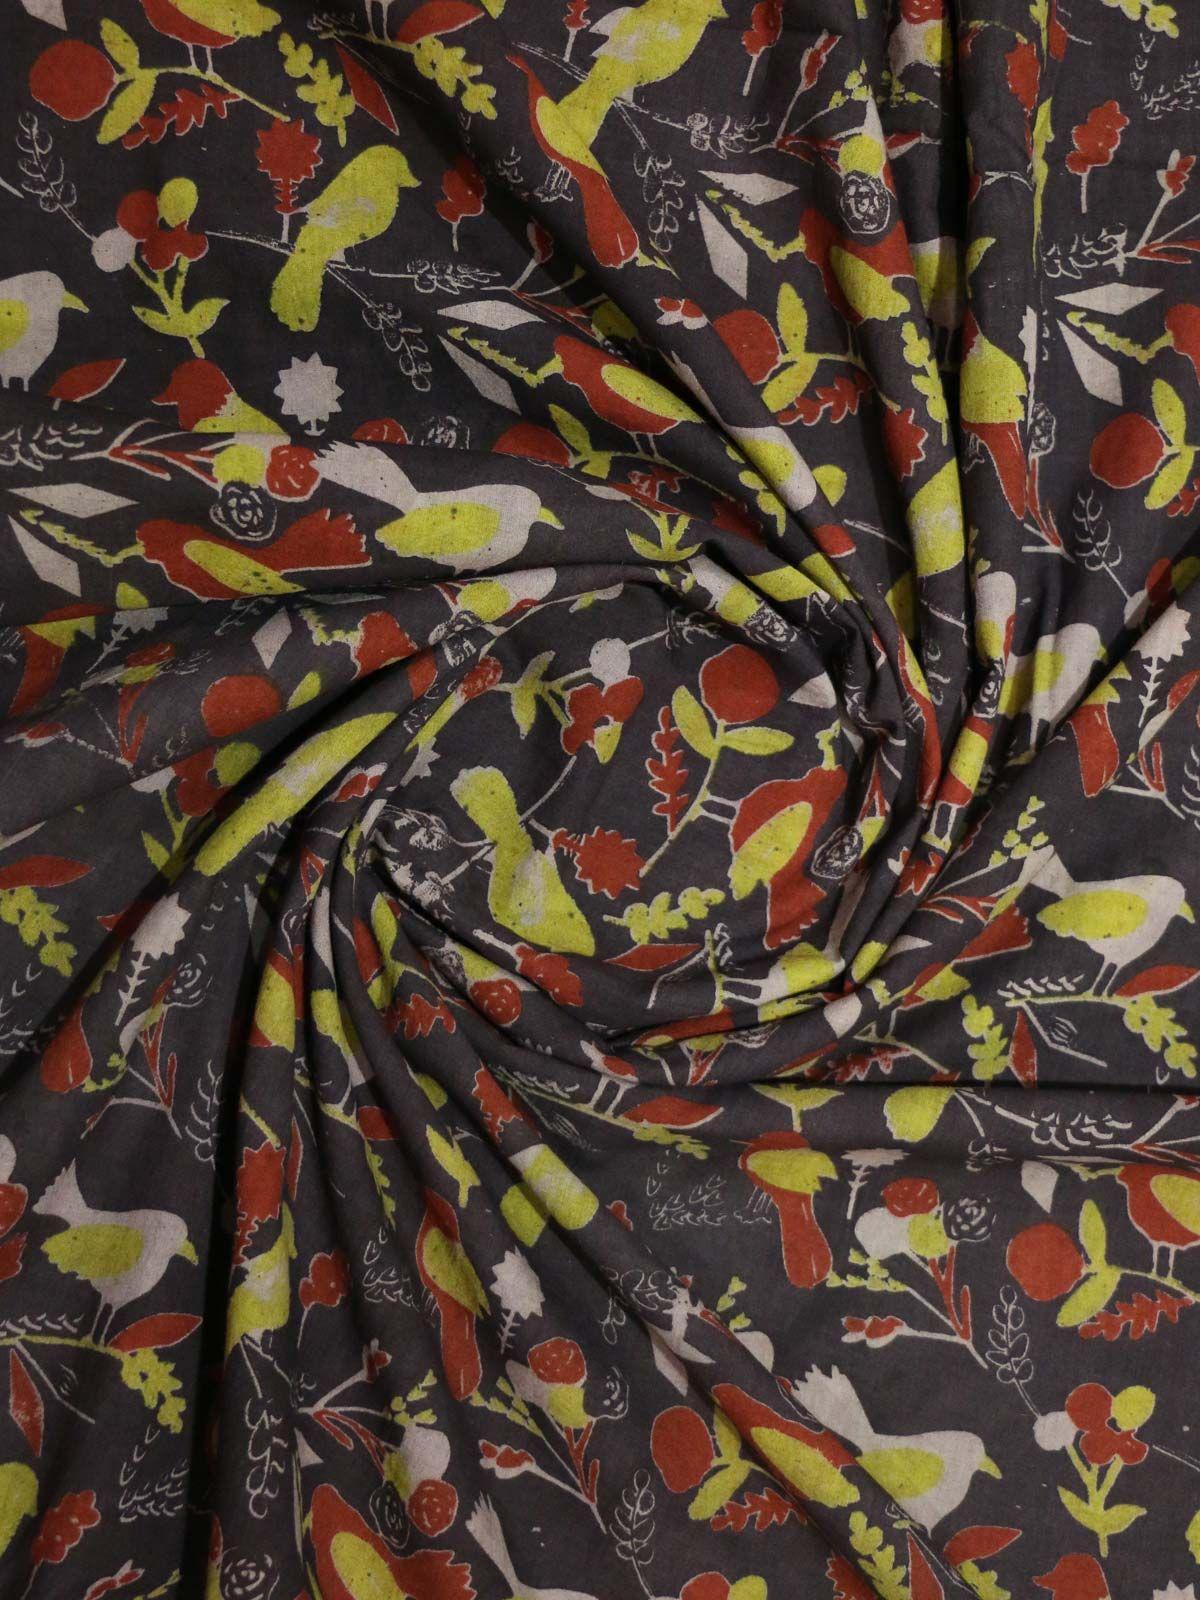 Multi color hand block printed kalamkari cotton fabric